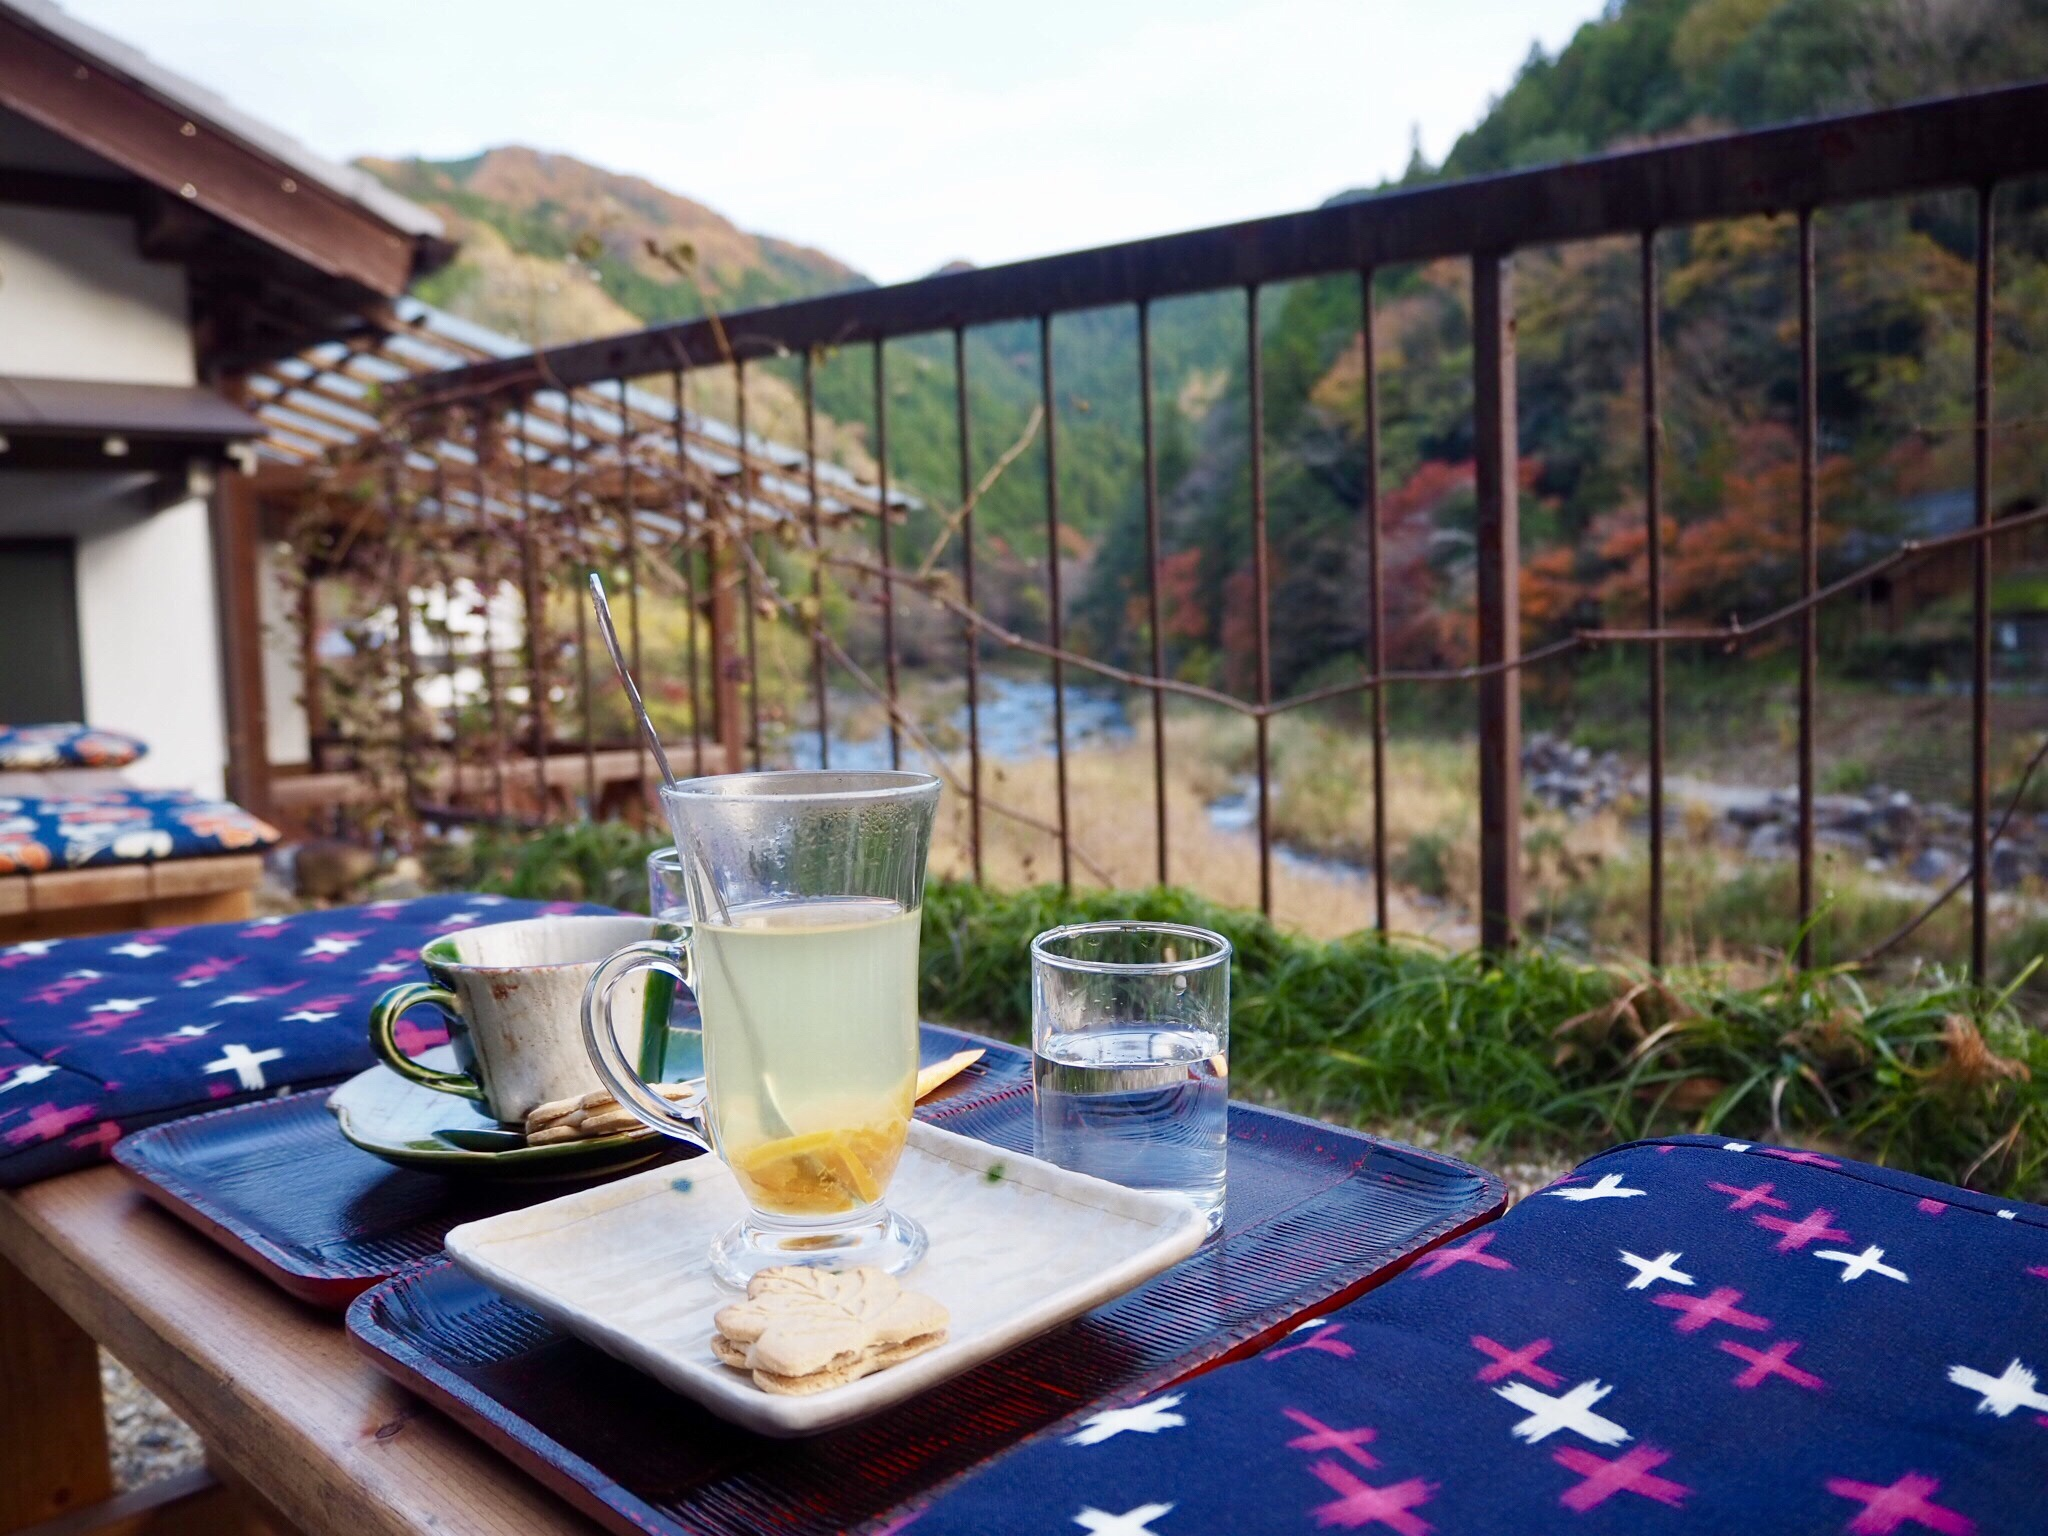 img 7530 - 香嵐渓 - 日本の秋を感じる 愛知県豊田市の紅葉スポット